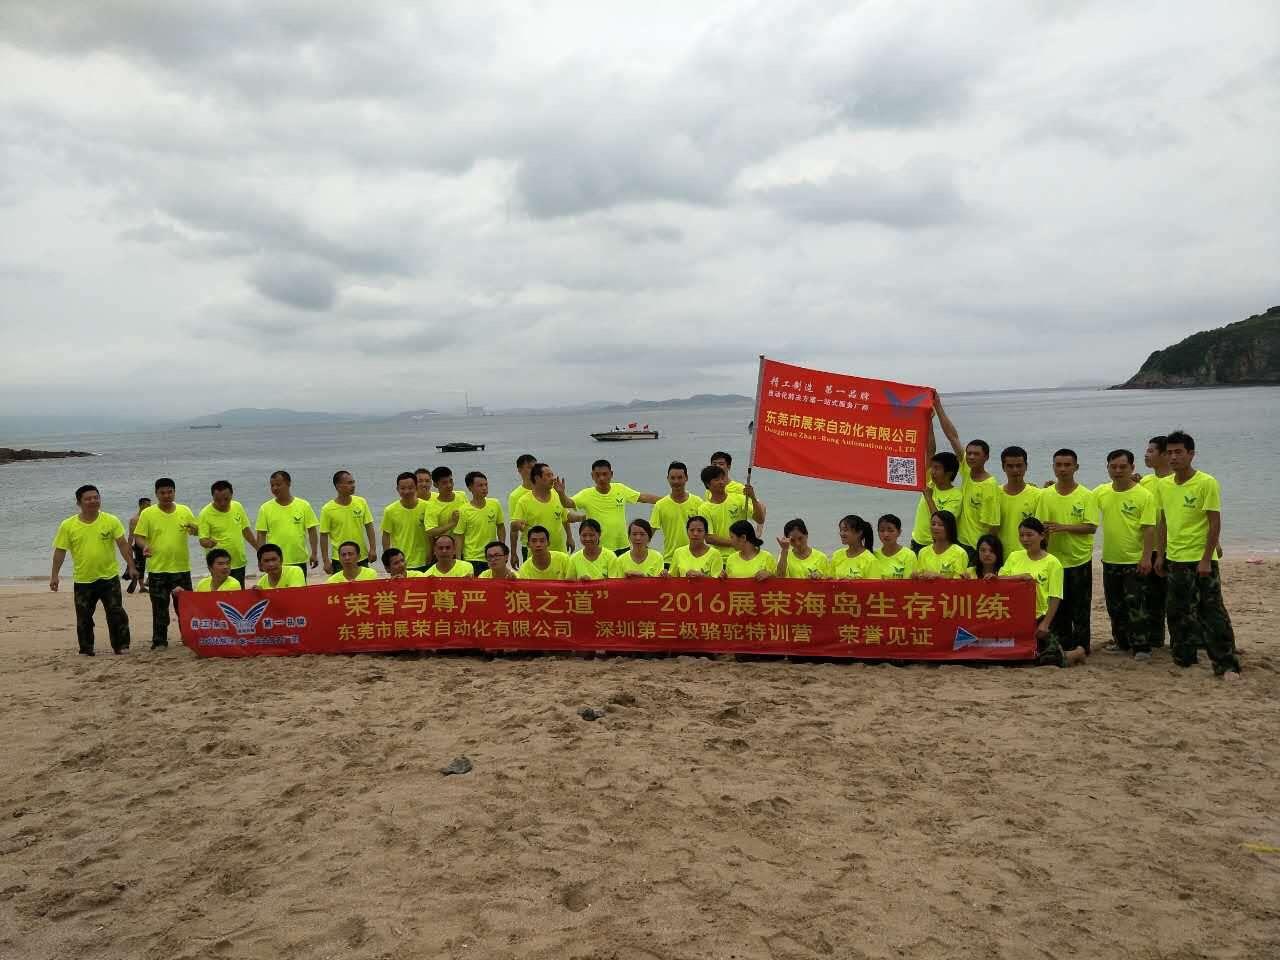 ONE电竞 团队海岛生存训练